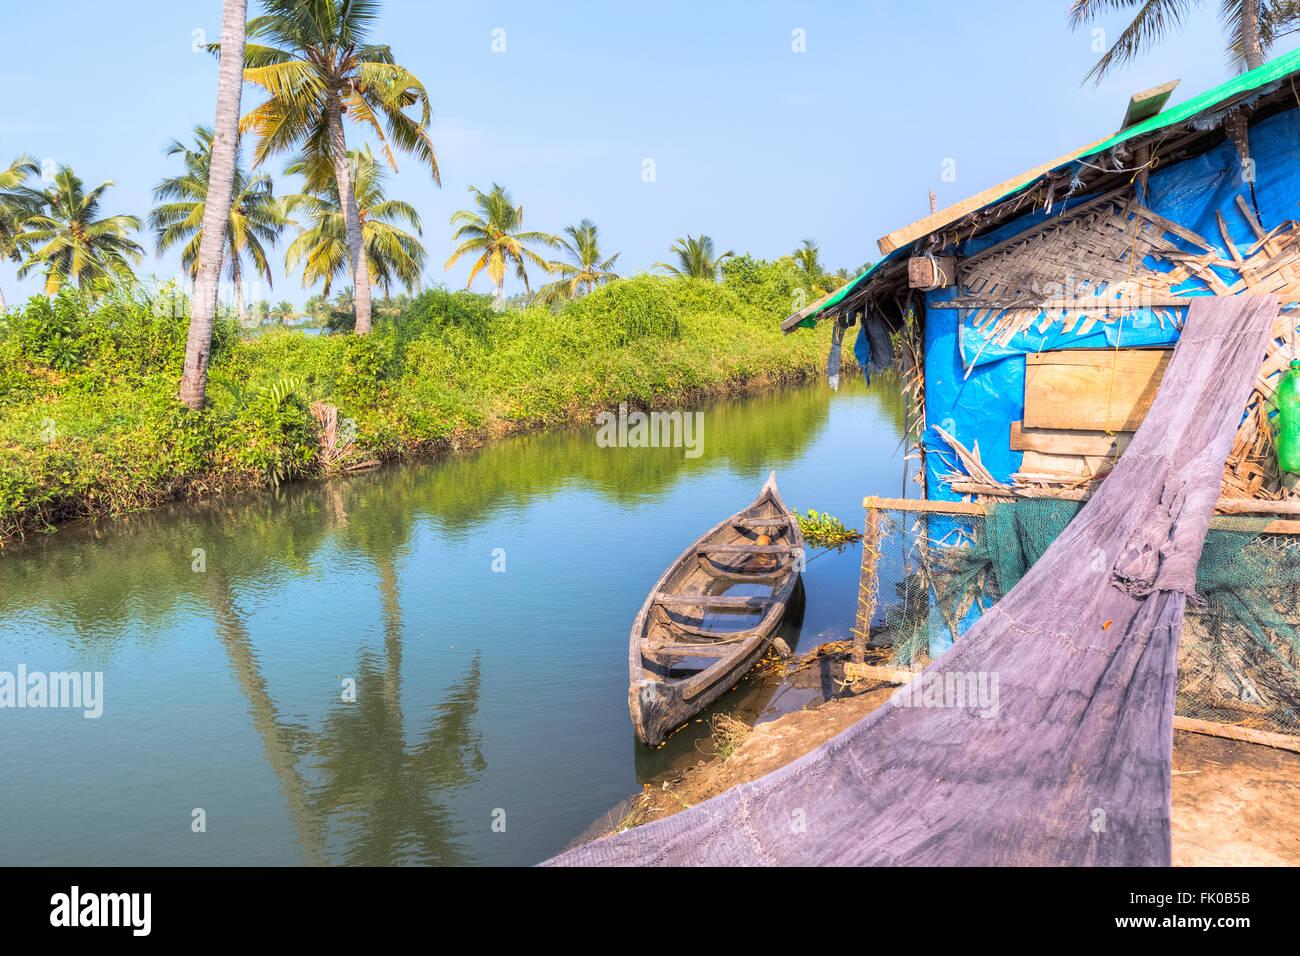 Fisherman's capanna di Kochi, in Kerala, India, Asia Immagini Stock